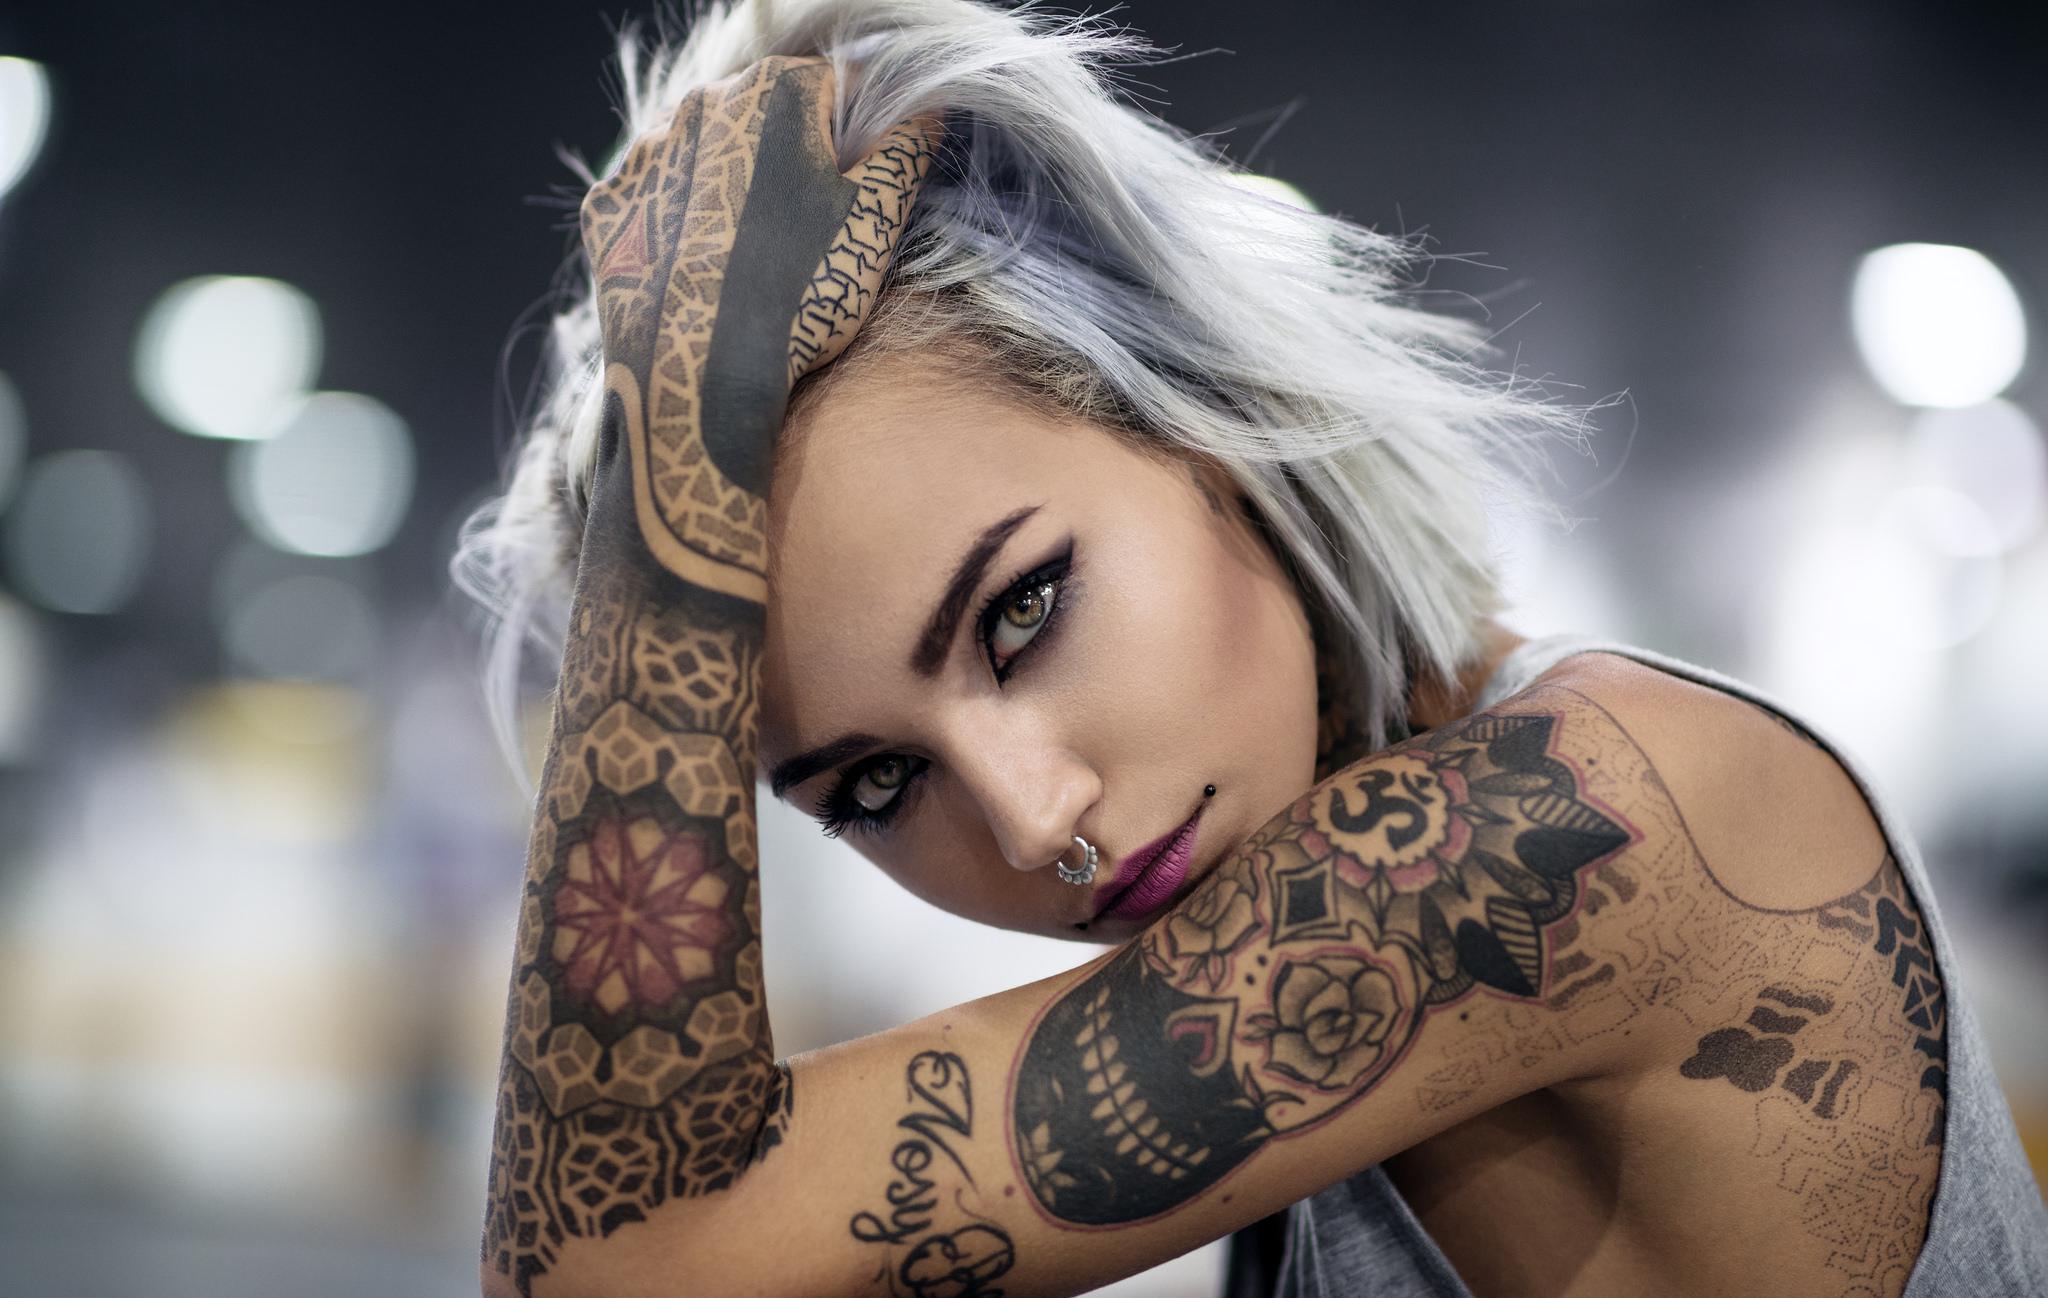 Tattoo chick — photo 15